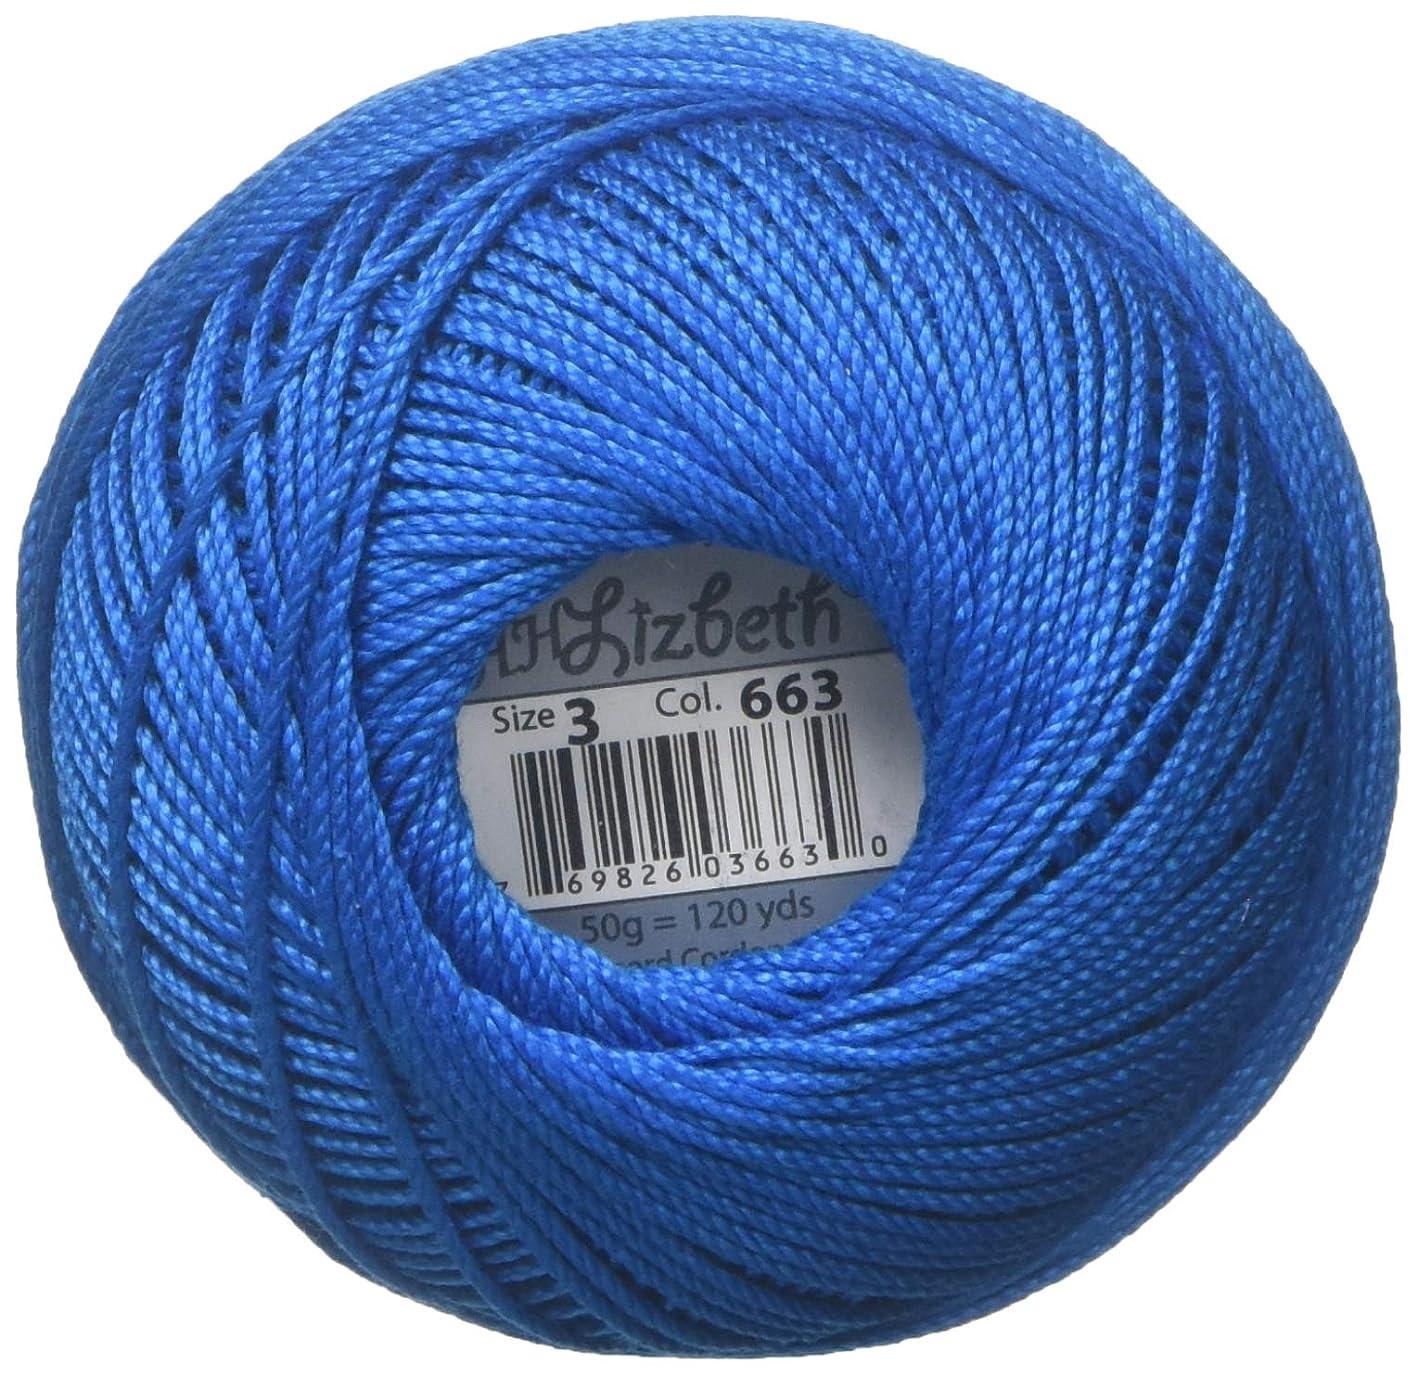 Superior Threads 11702-5005 Fantastico Variegated Trilobal Polyester 2000yd October Thread 2,000 Yds. rfeazvafekr467